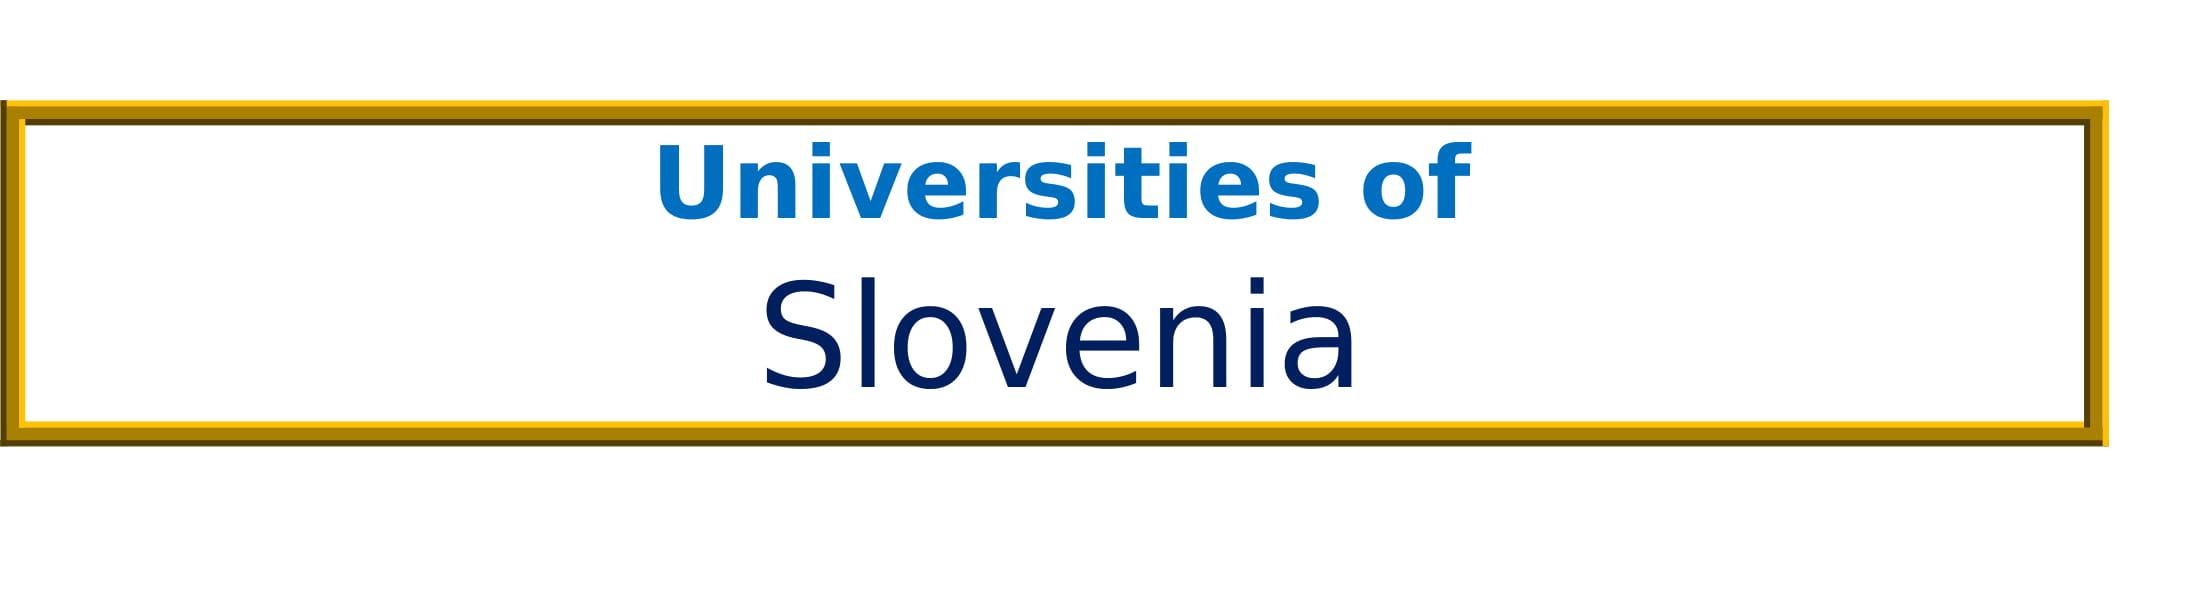 List of Universities in Slovenia